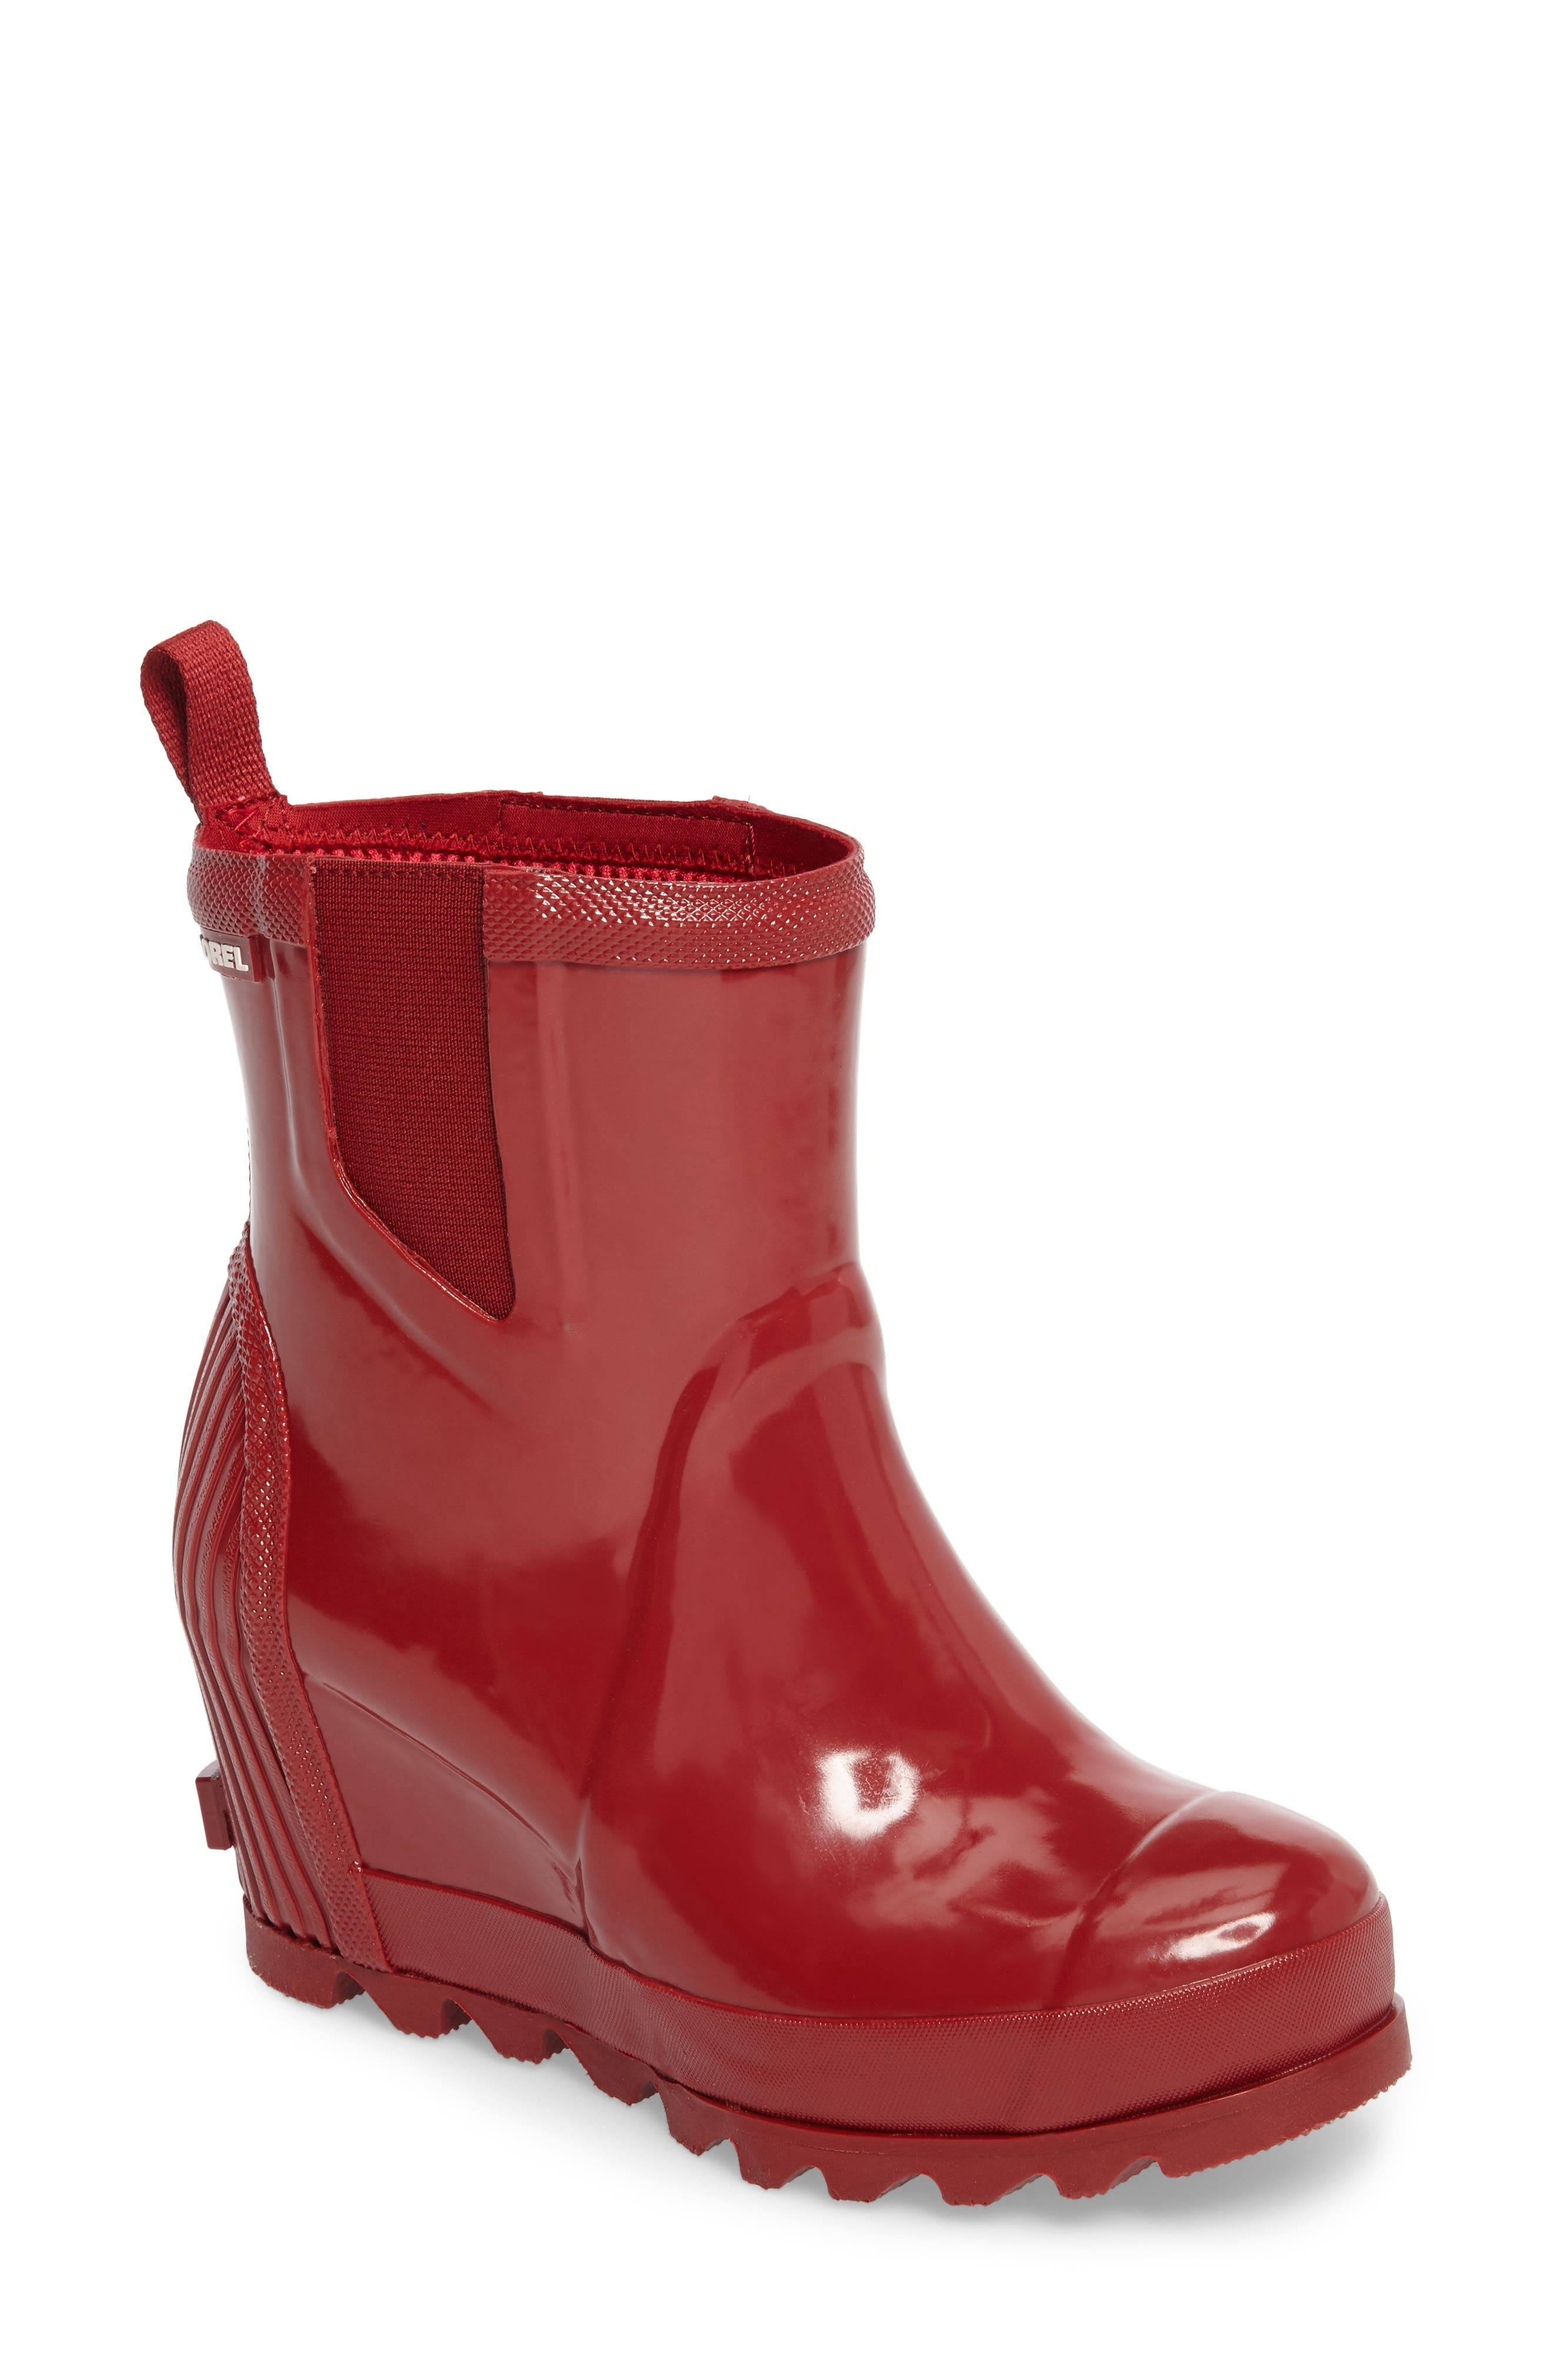 Joan Glossy Wedge Rain Boot,                             Main thumbnail 1, color,                             Red Dahlia/ Candy Apple